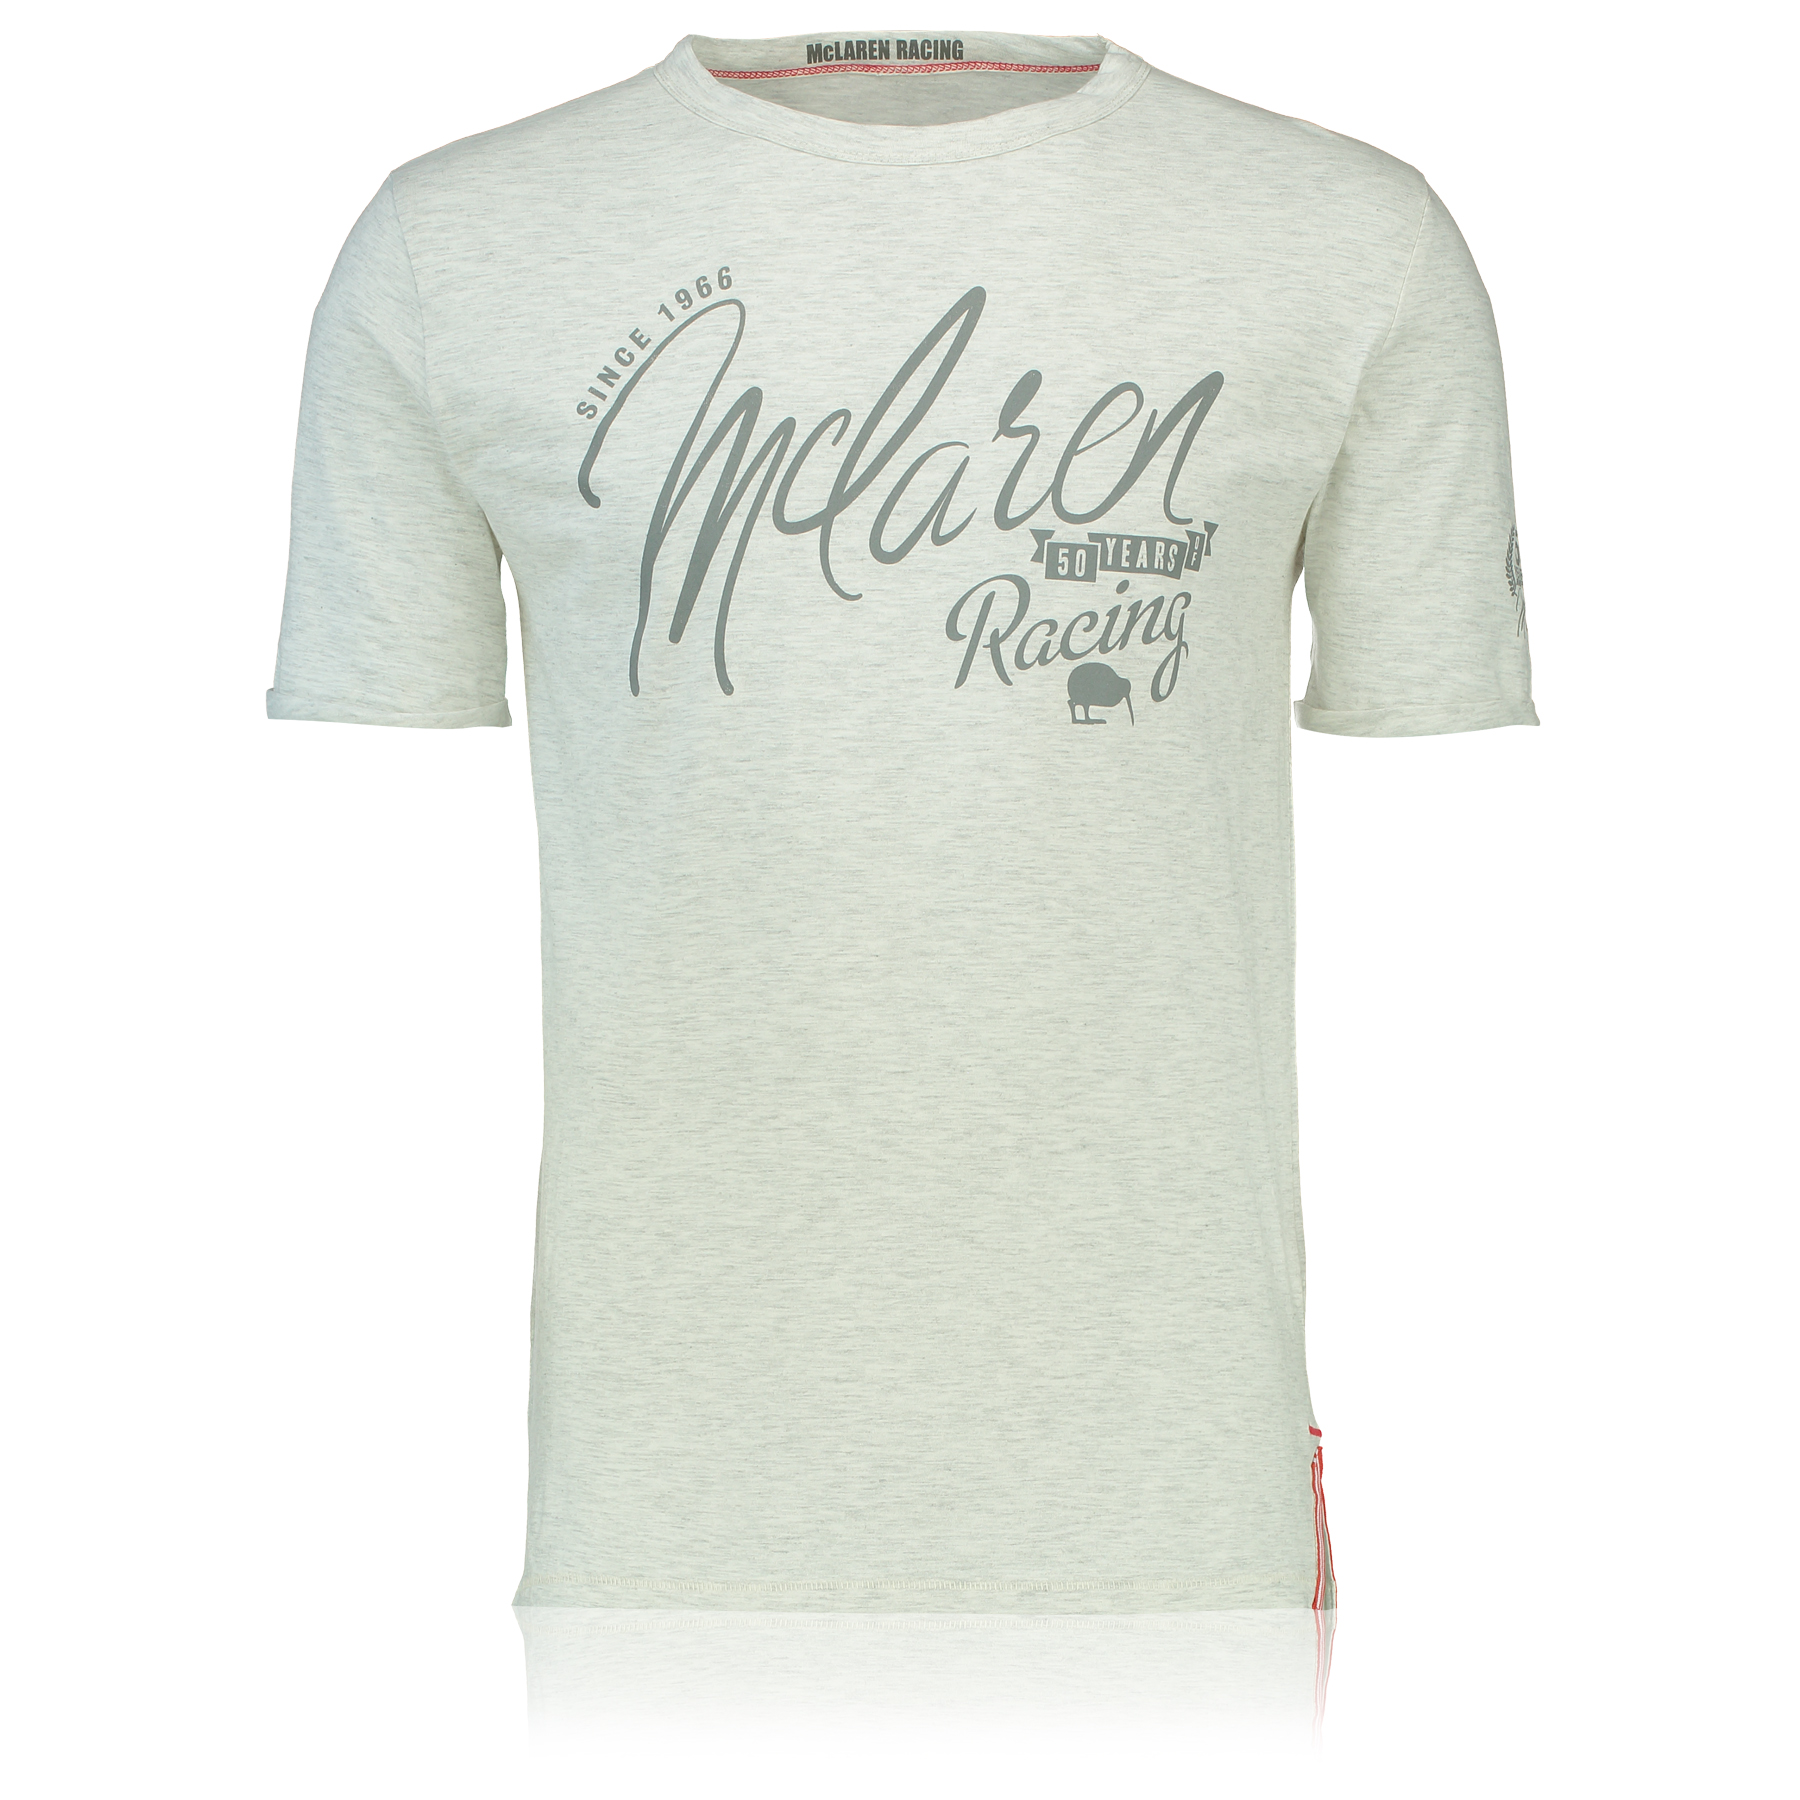 Image of McLaren 50 - FiftyYears of Racing T-Shirt